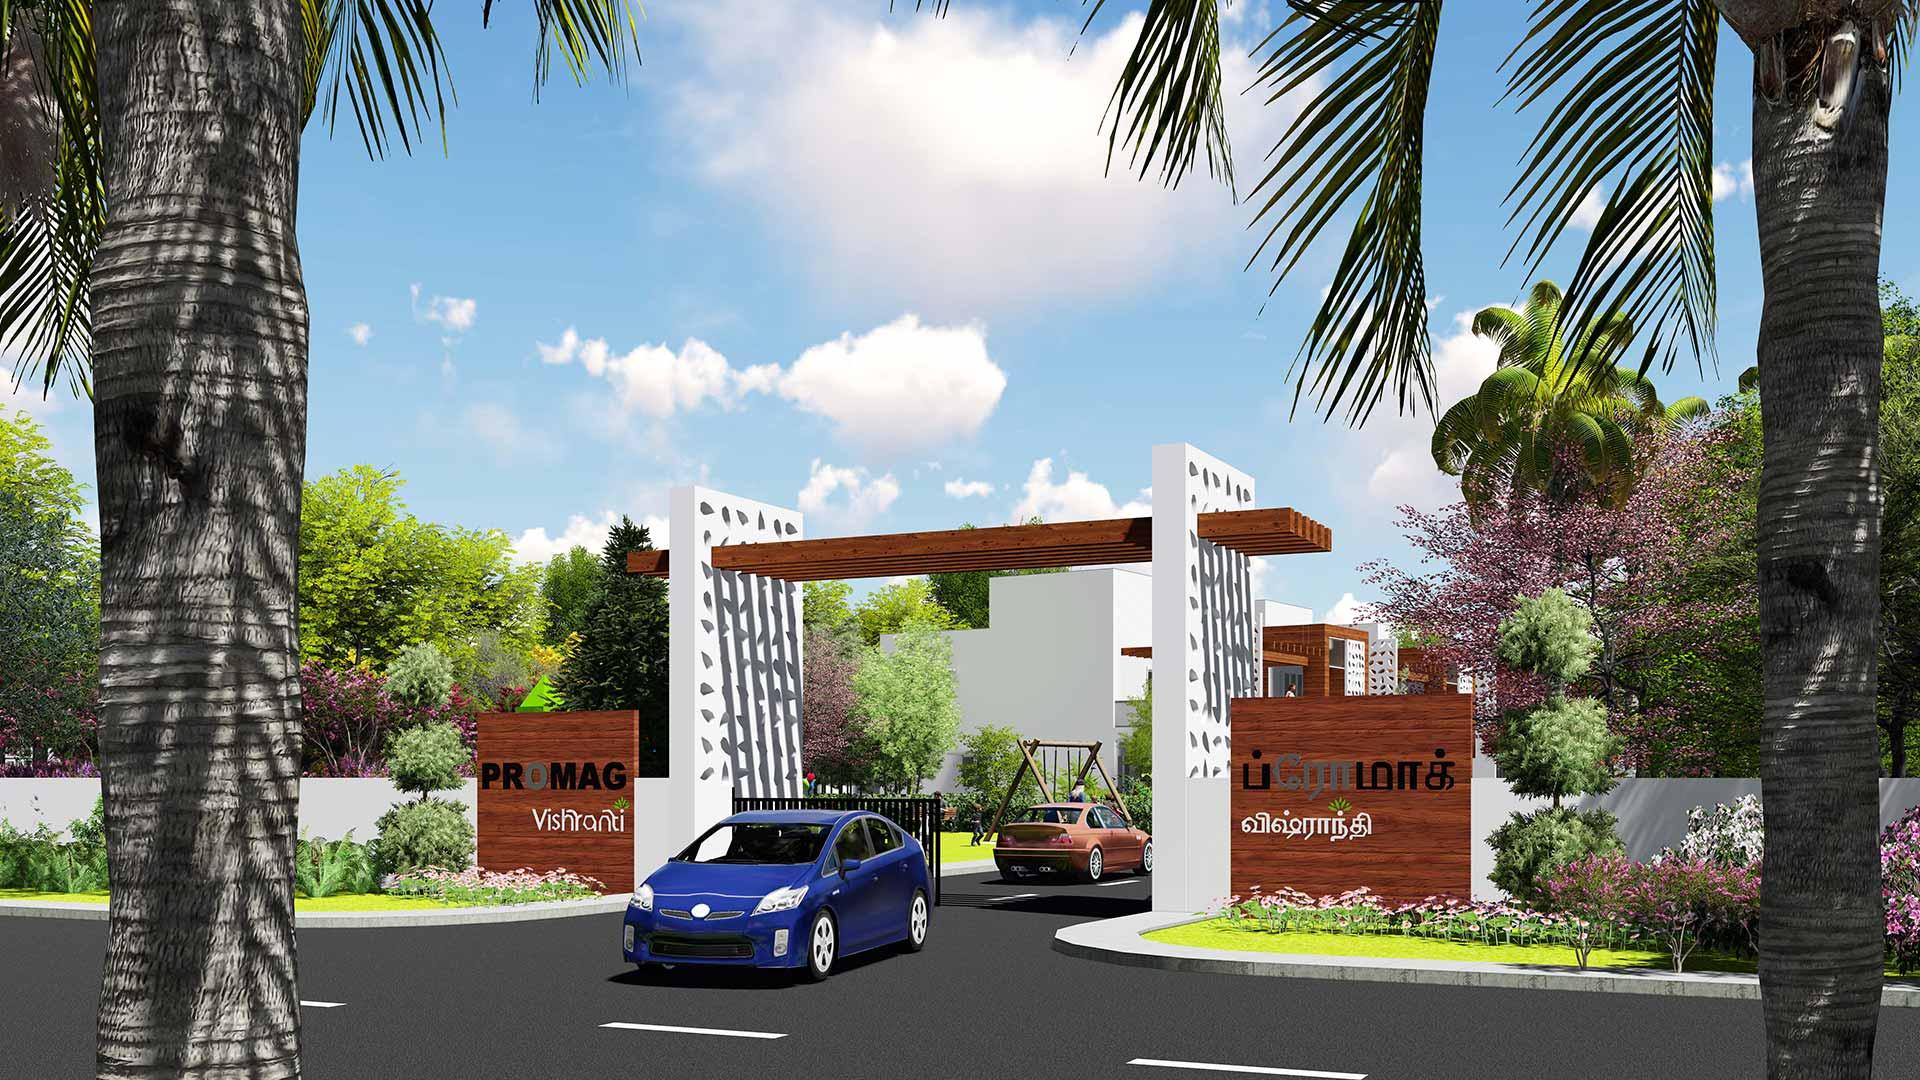 Promag Vishranti Coimbatore